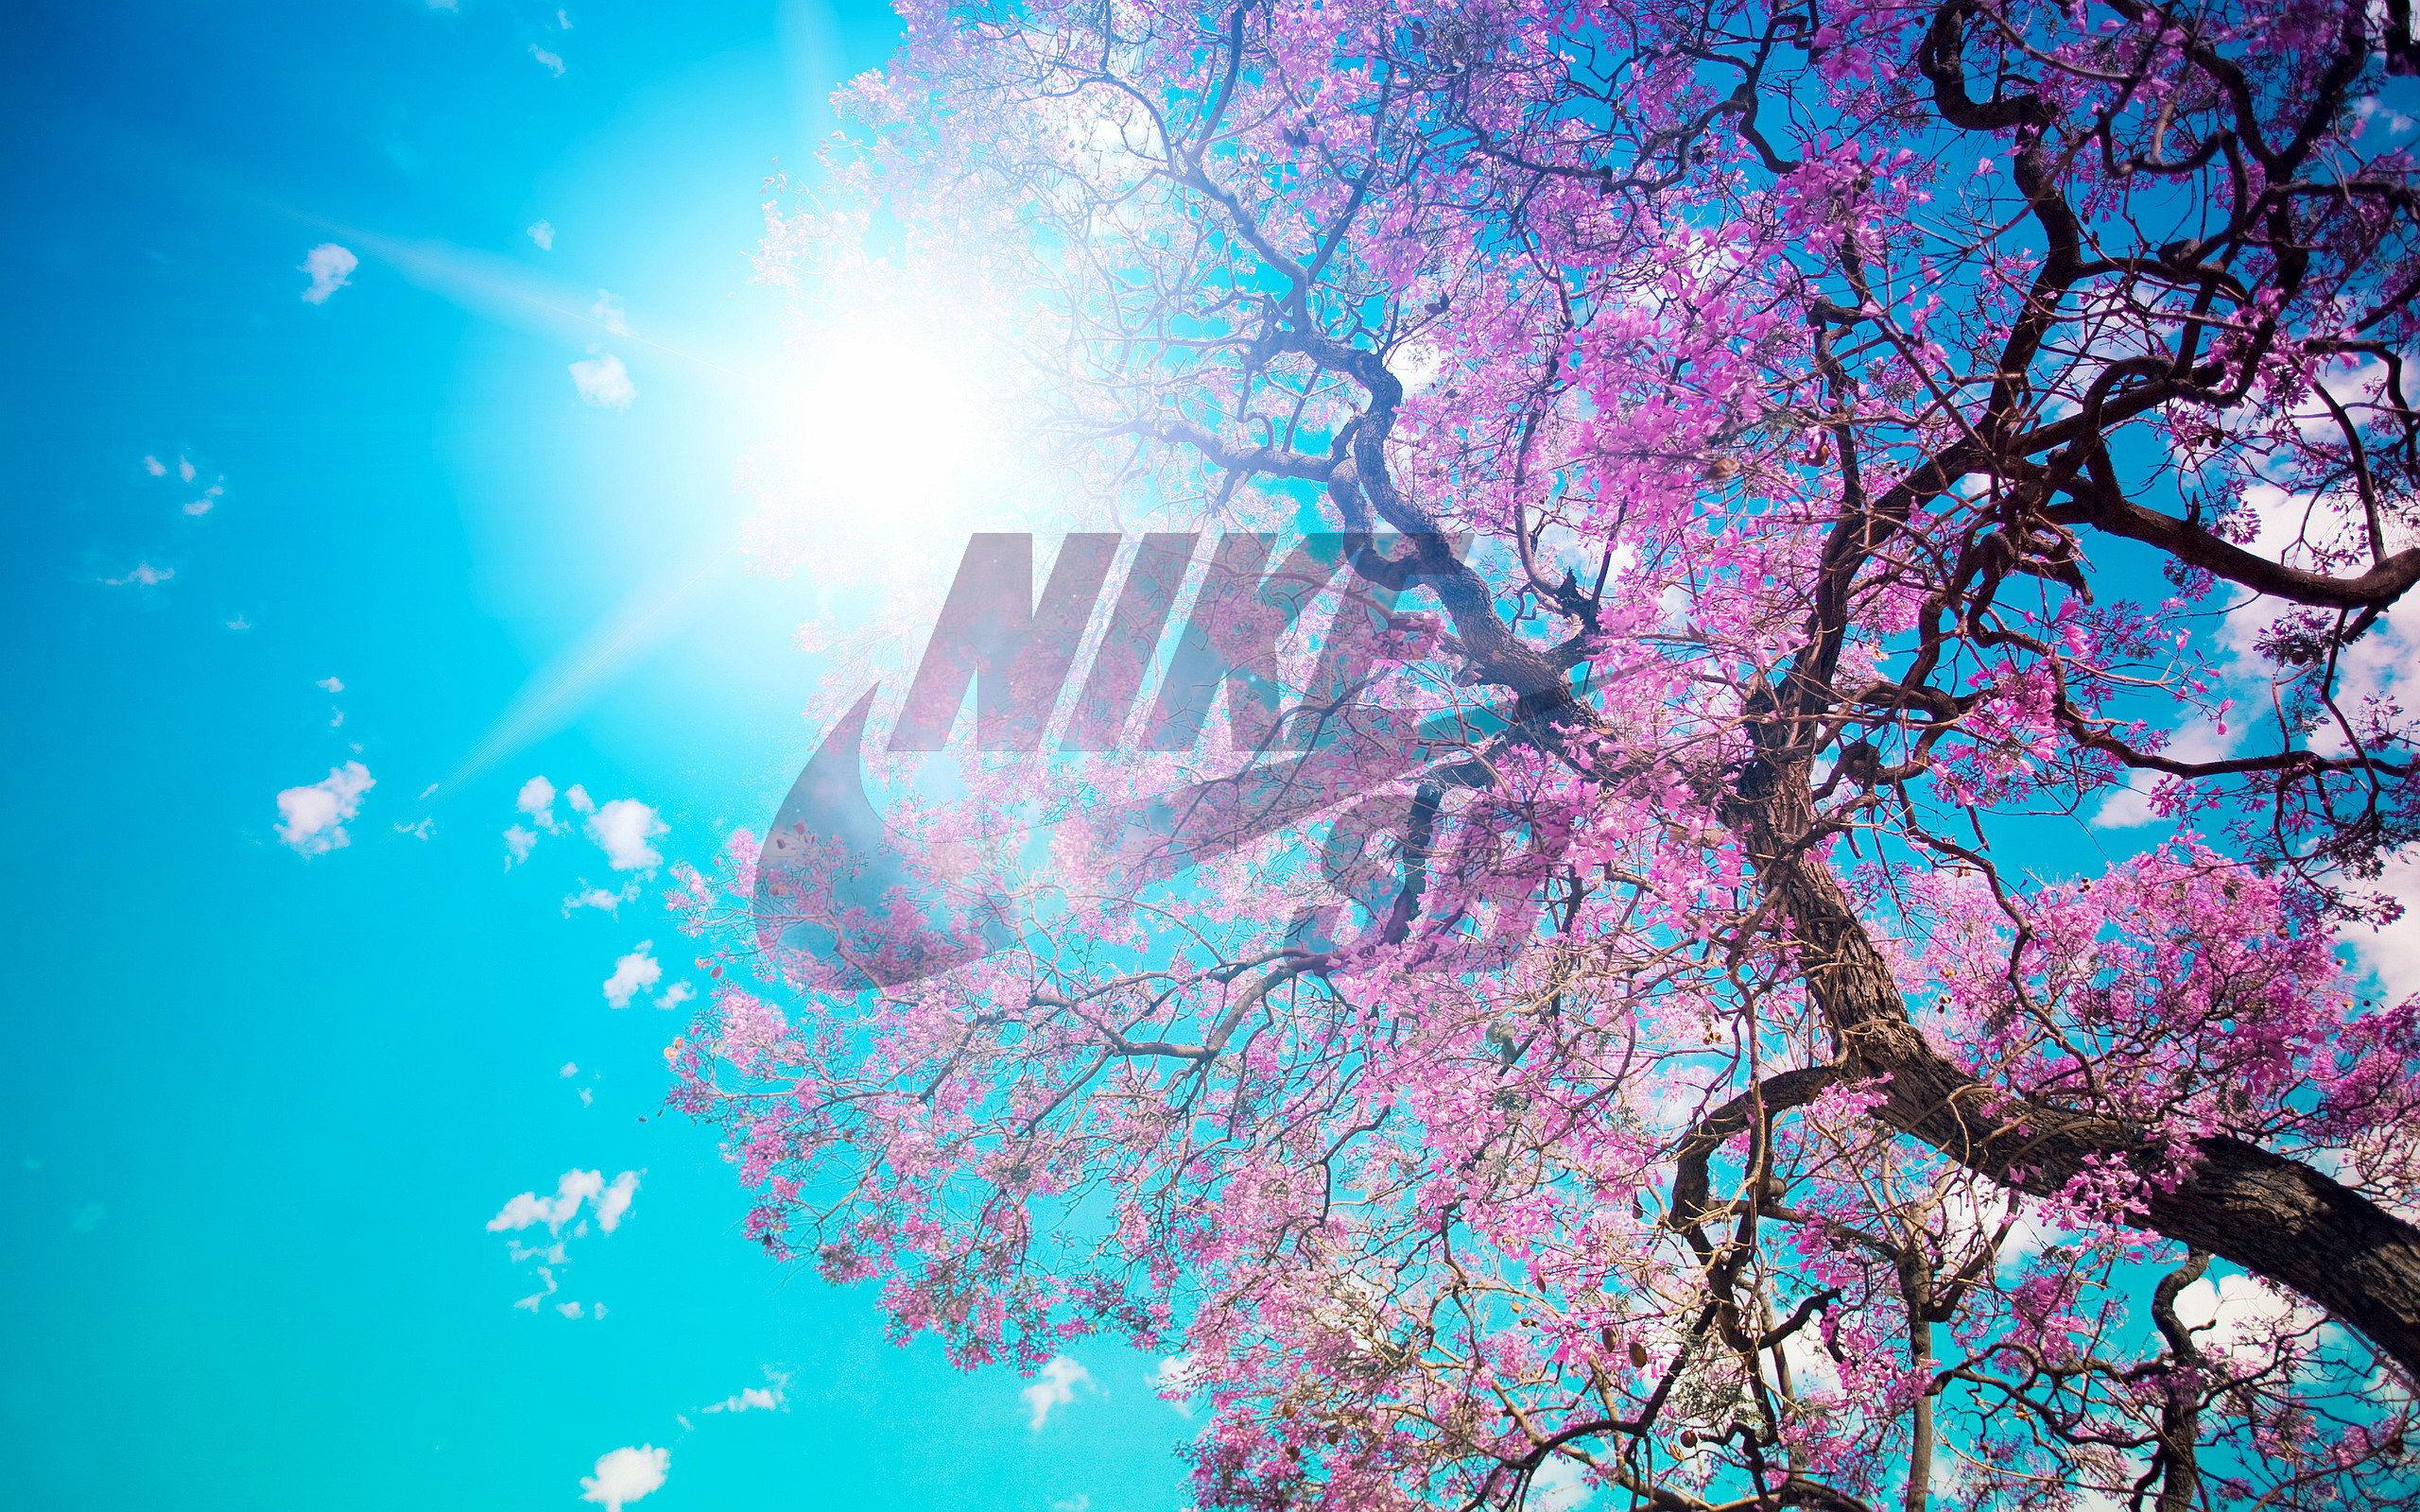 Nike Backgrounds Tumblr Tumblr static 6szjdkzjvm8sco4 2560x1600